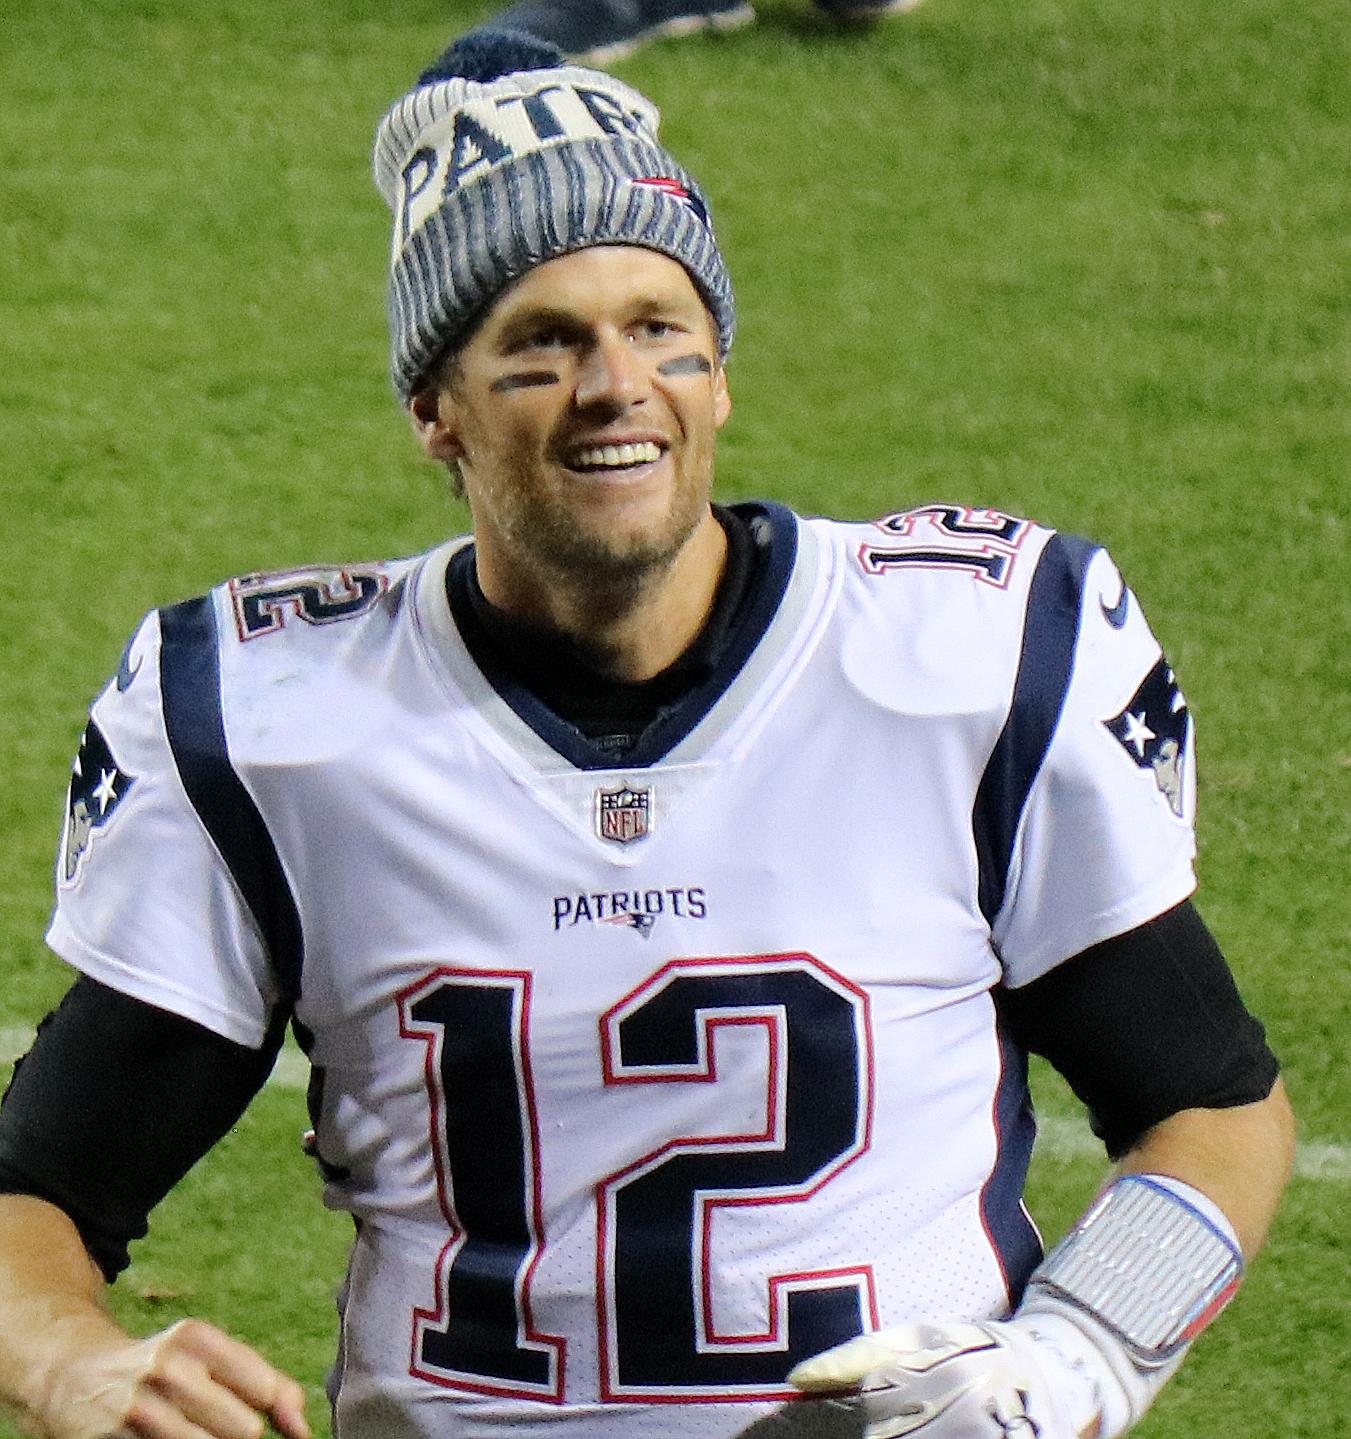 Tom Brady, national football league quarterback (photo credit: Jeffrey Beall via Wikimedia Commons under Creative Commons license)